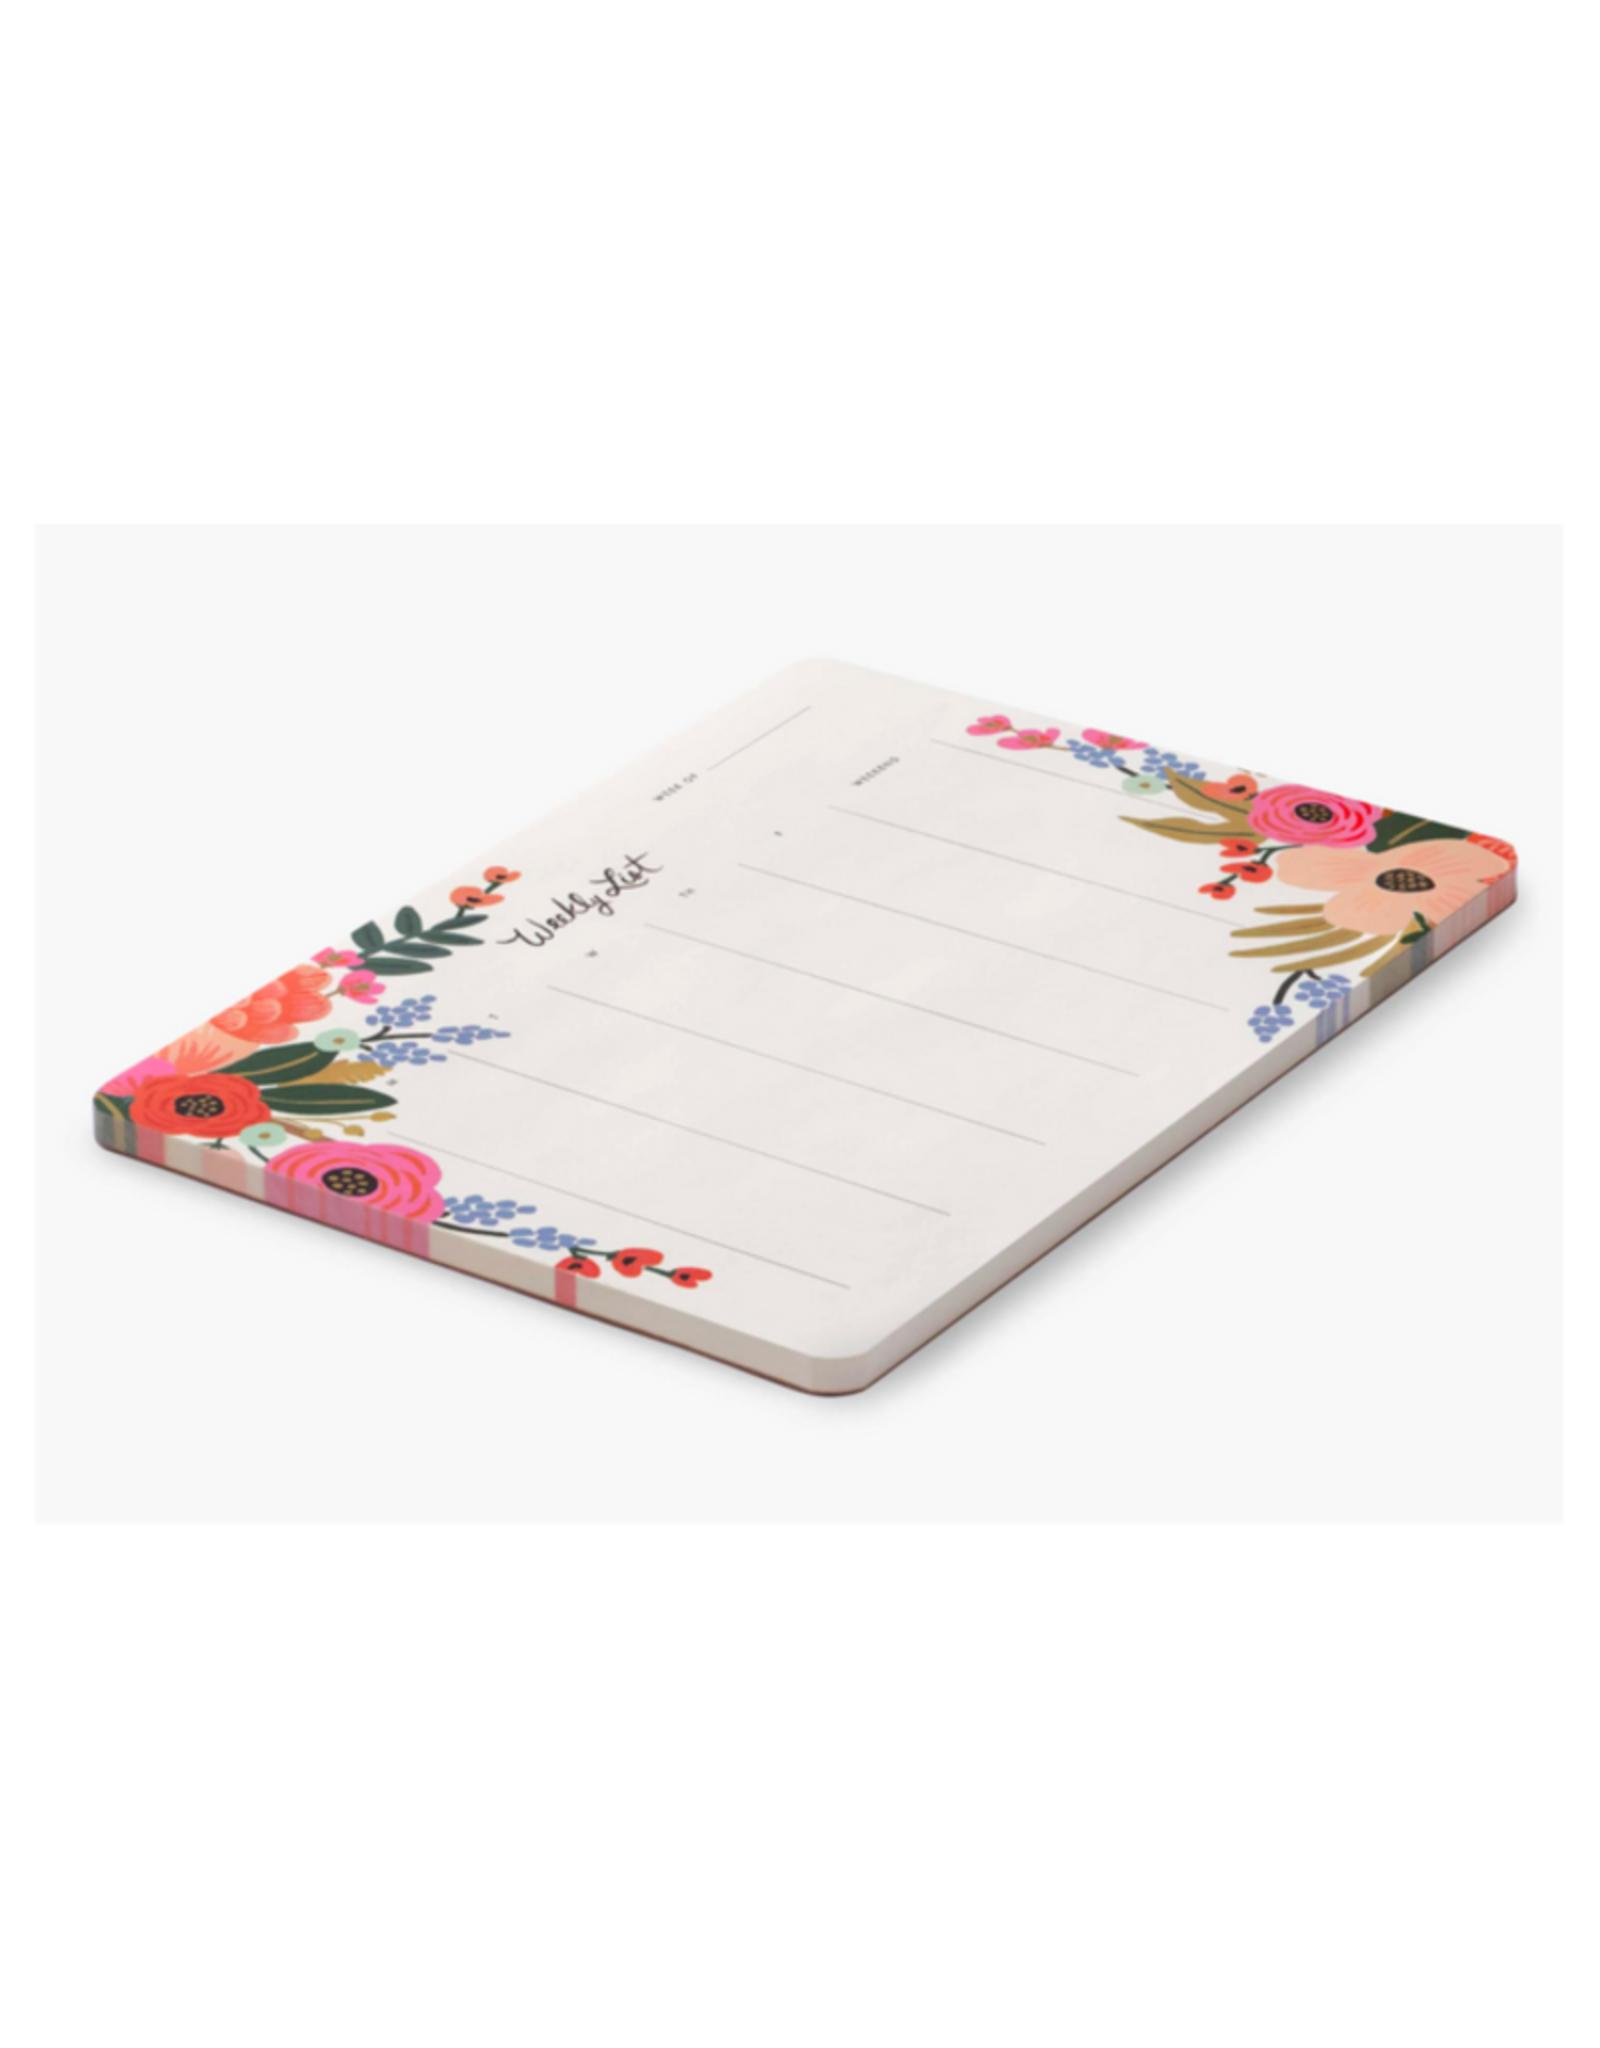 Weekly Planner Desk Pads - 3 Patterns